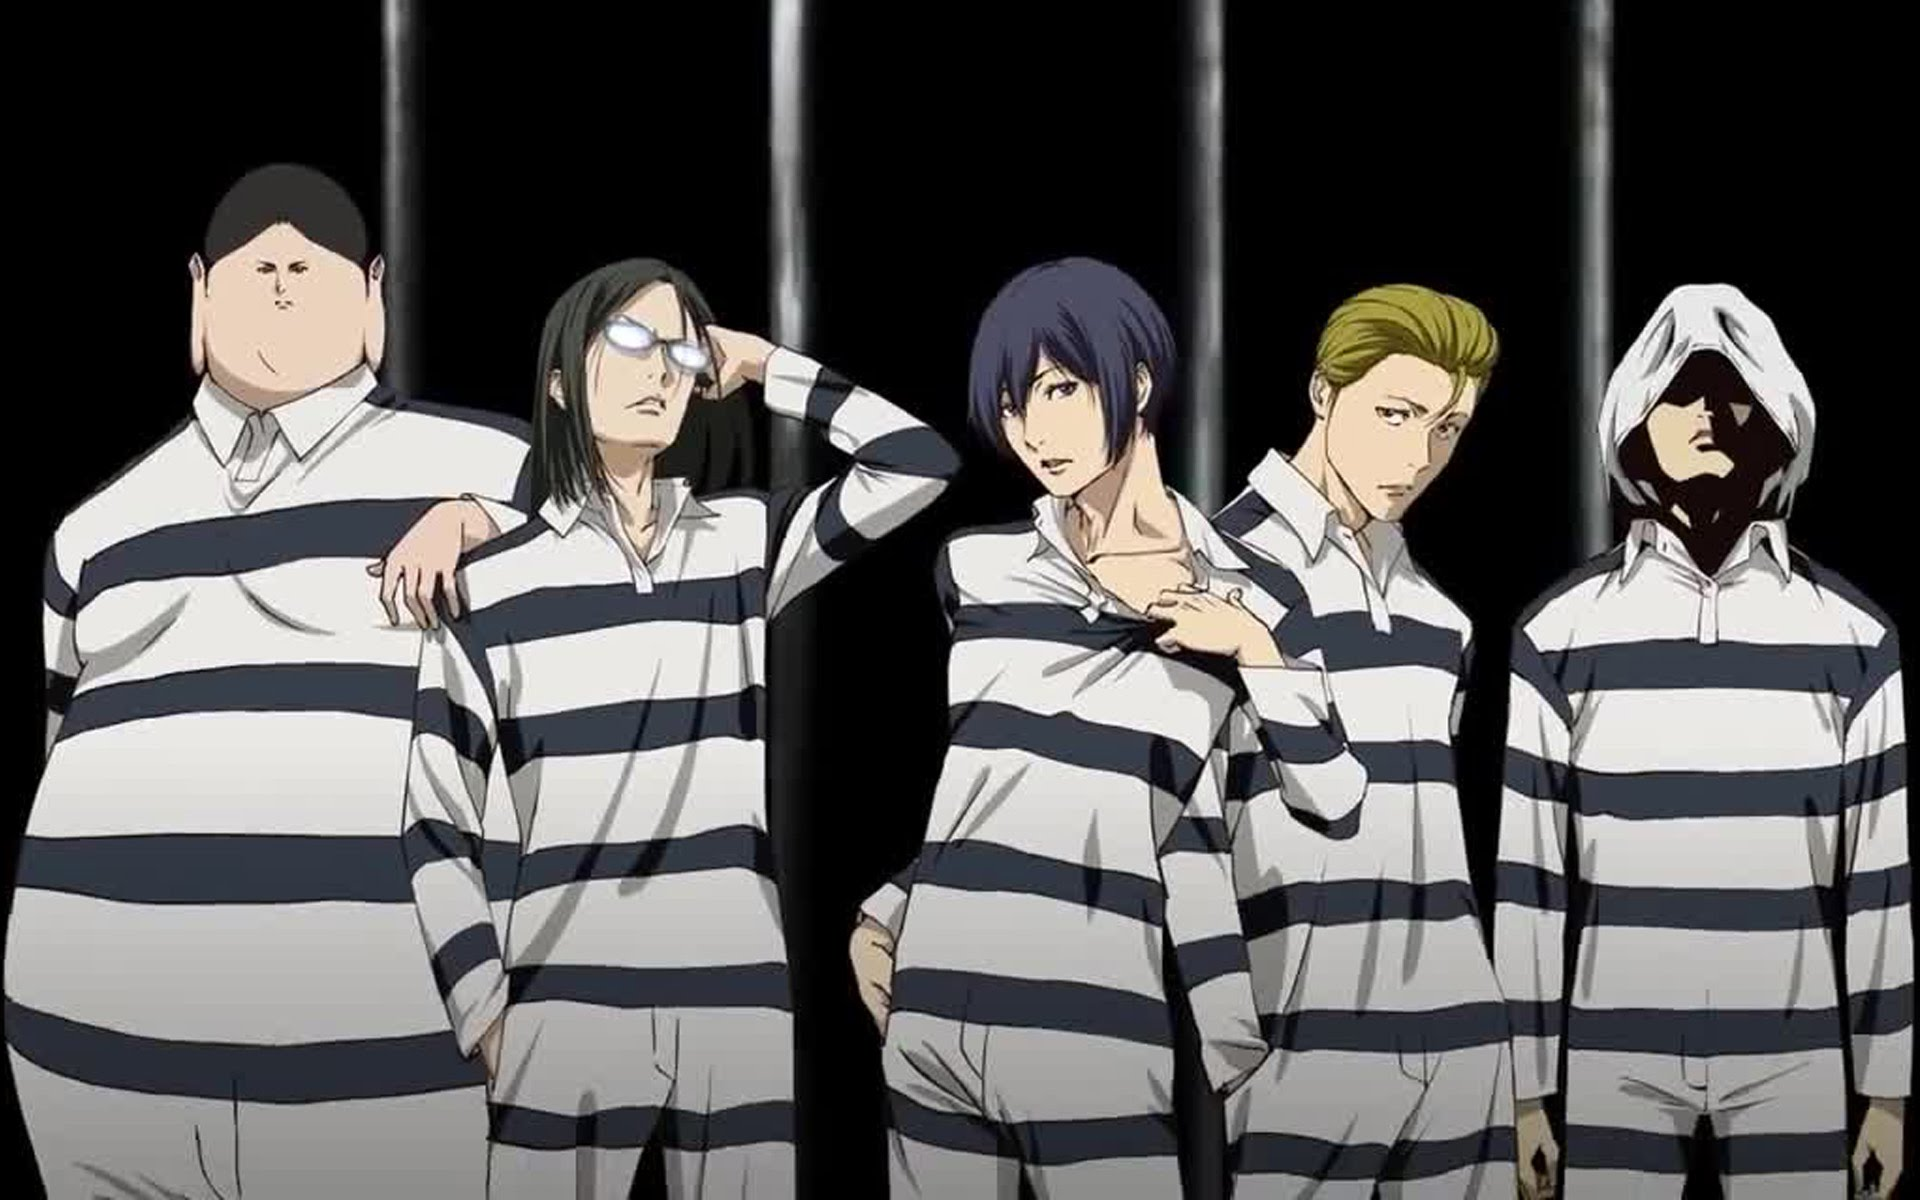 16363 prison school anime wallpaper 1920x1200